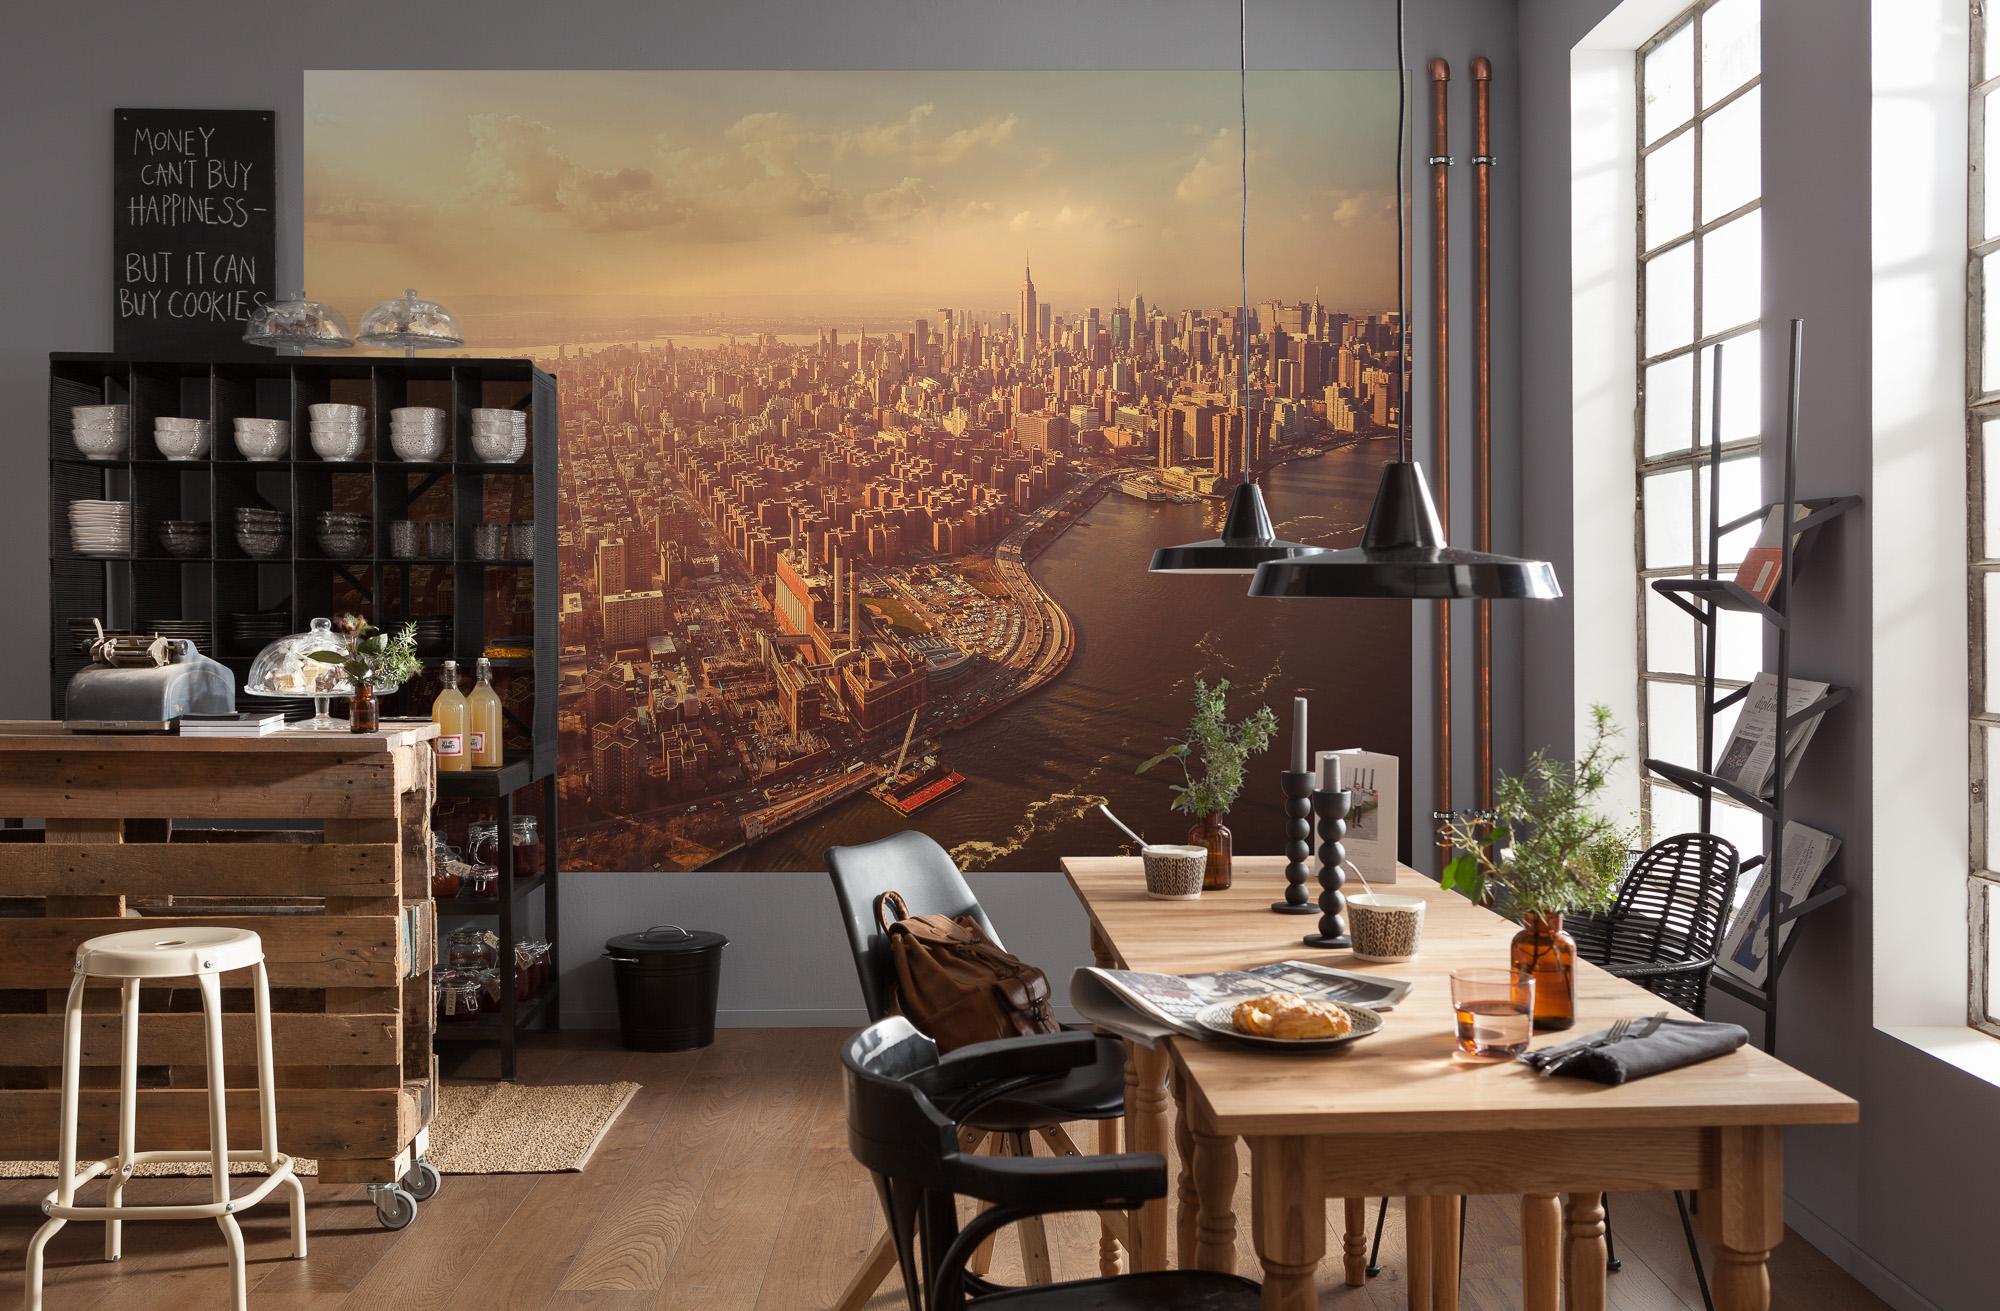 Fototapeten Küche   3d Fototapete Fenster Mit Natur Laubengang ...